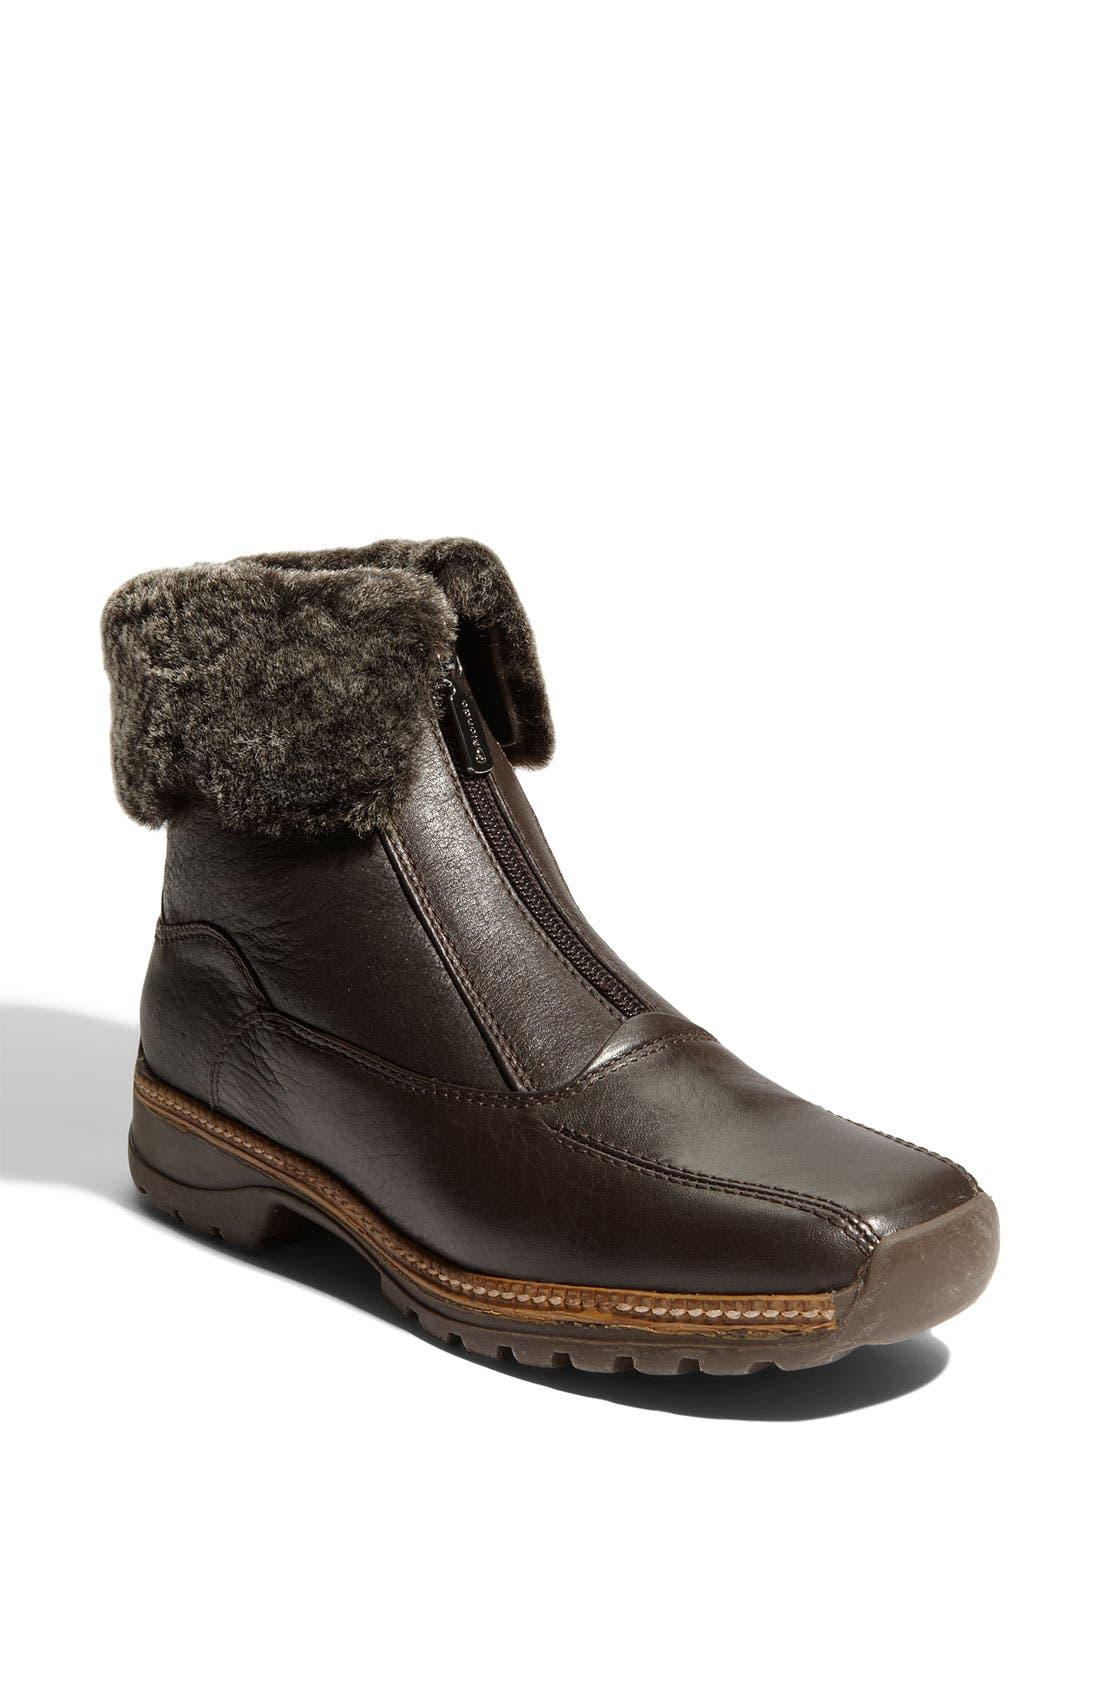 Alternate Image 1 Selected - Blondo 'Nourlat' Waterproof Boot